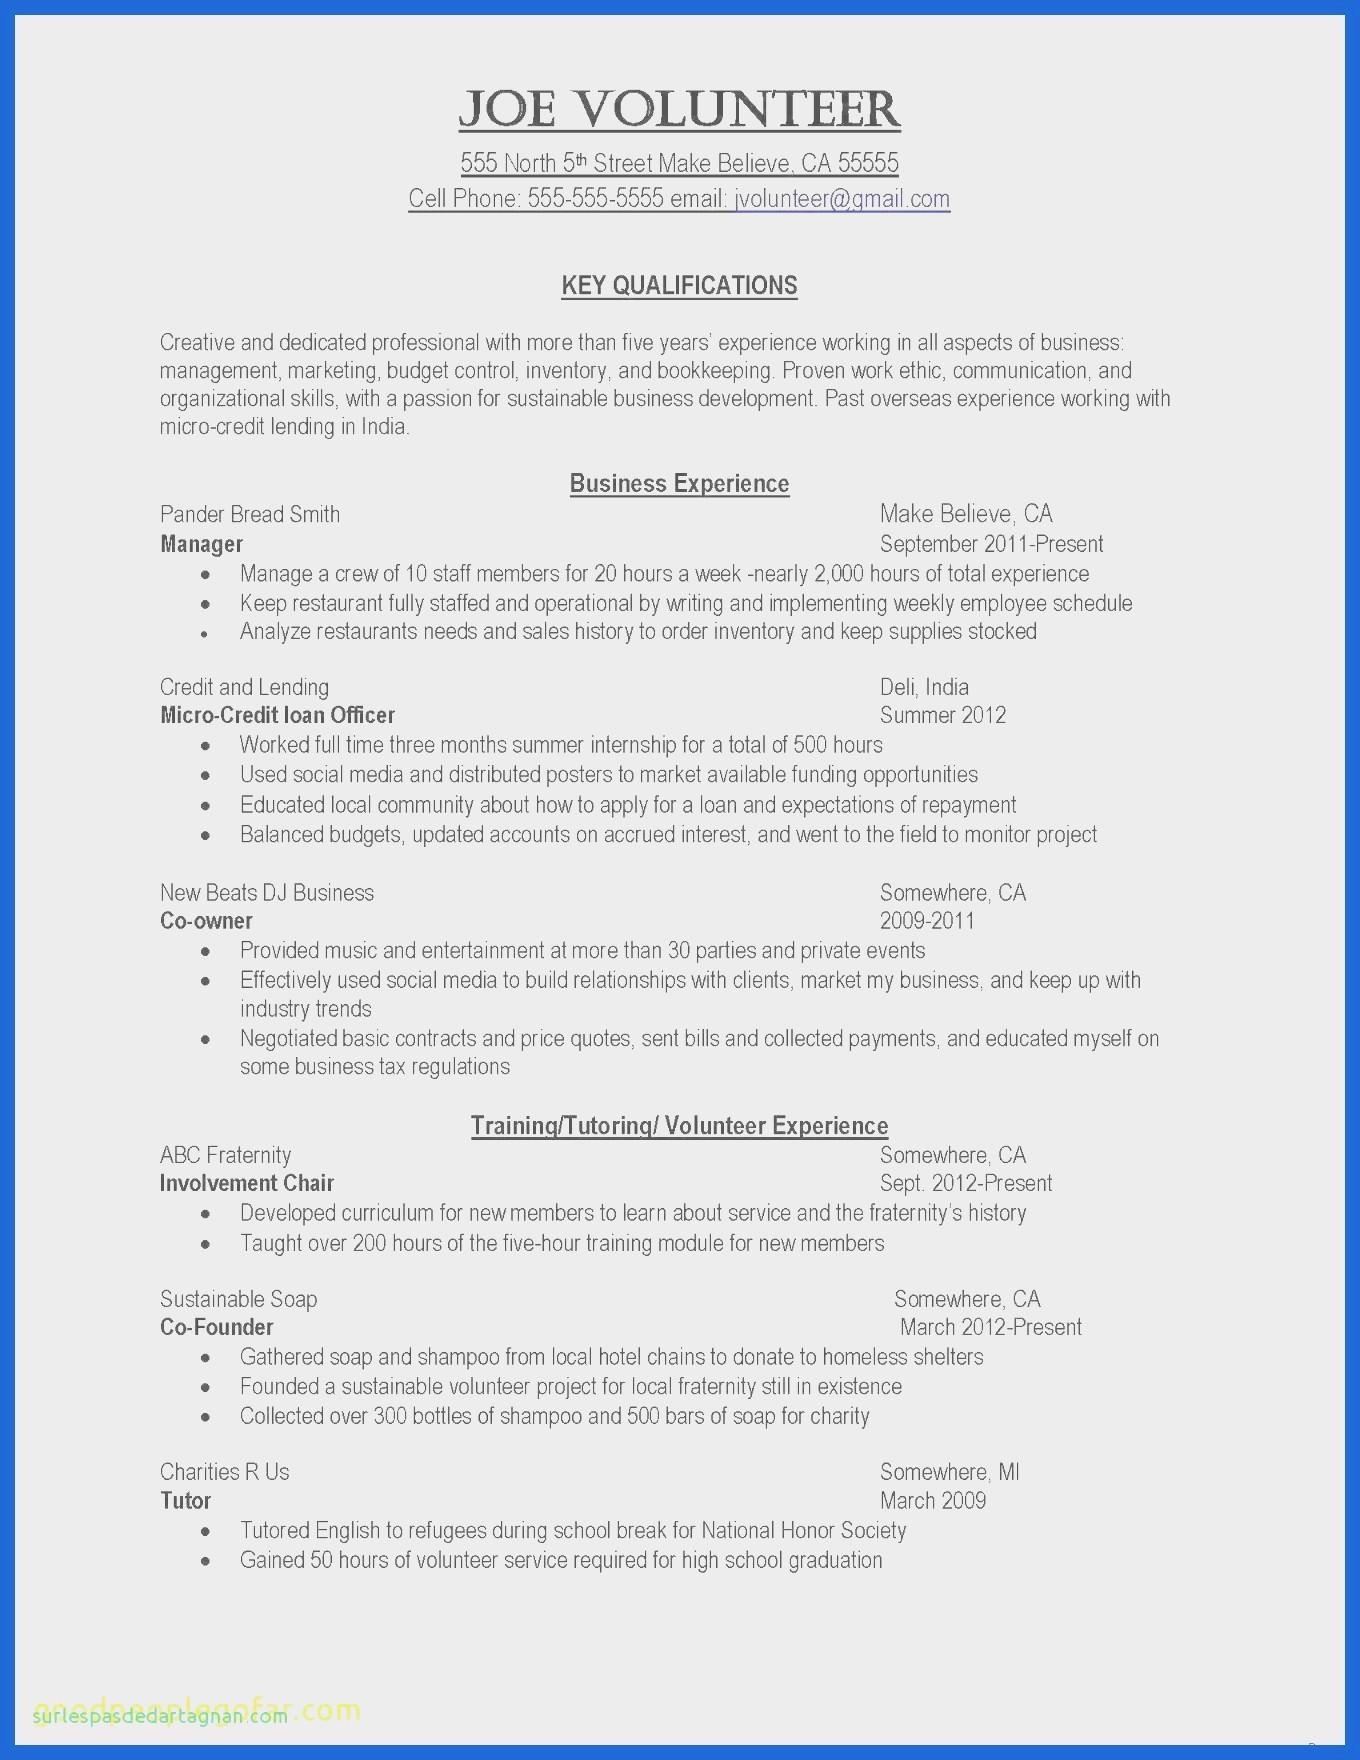 March Calendar Templates Más Recientes Ach Agreement Template Lera Mera Business Document Template Of March Calendar Templates Más Actual Calendar Lovely Free Calendar Pages Resume Template Resume